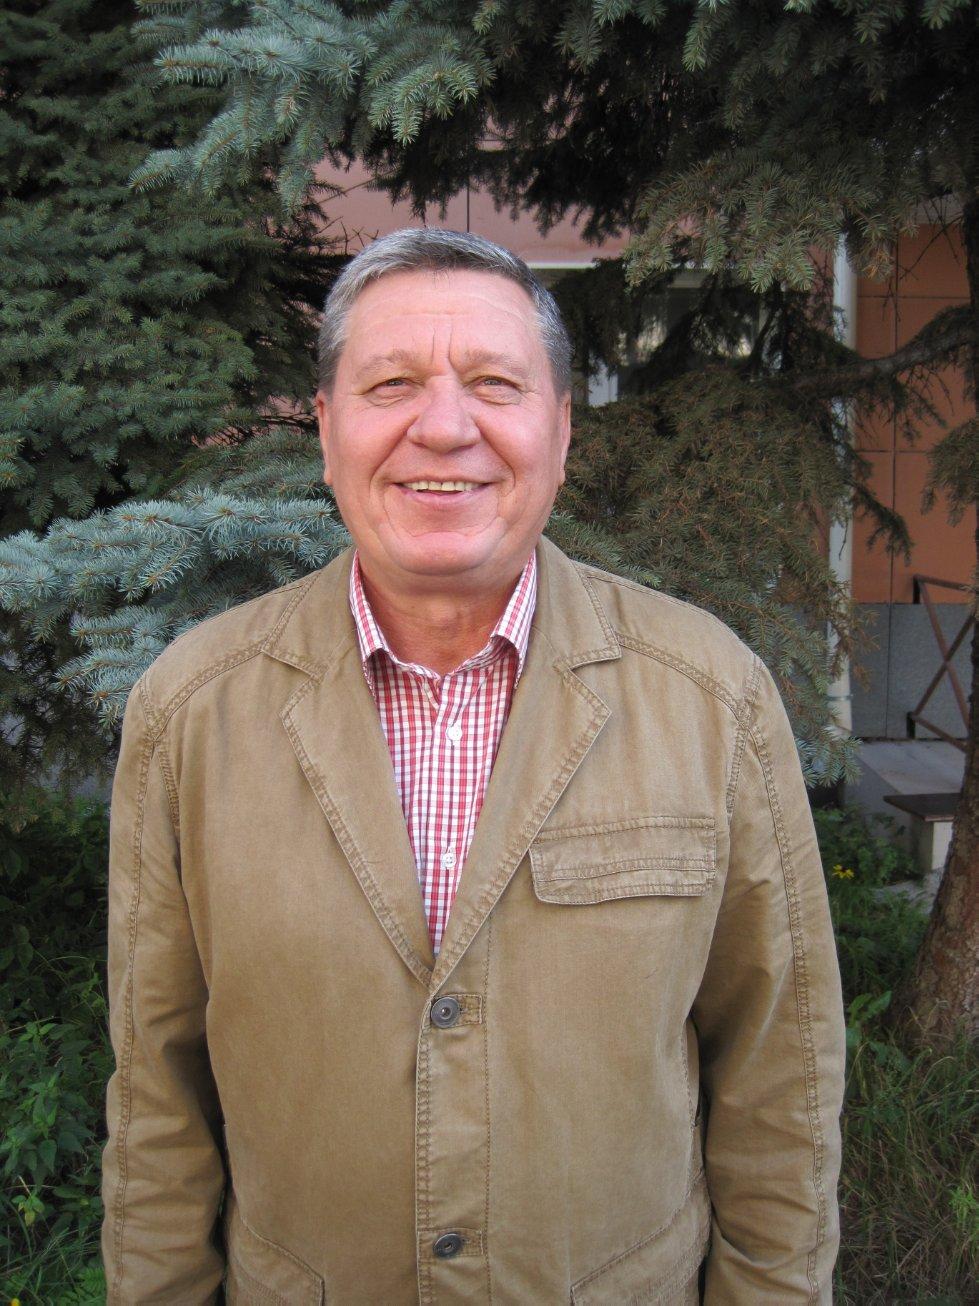 Martyanov Oleg Petrovich